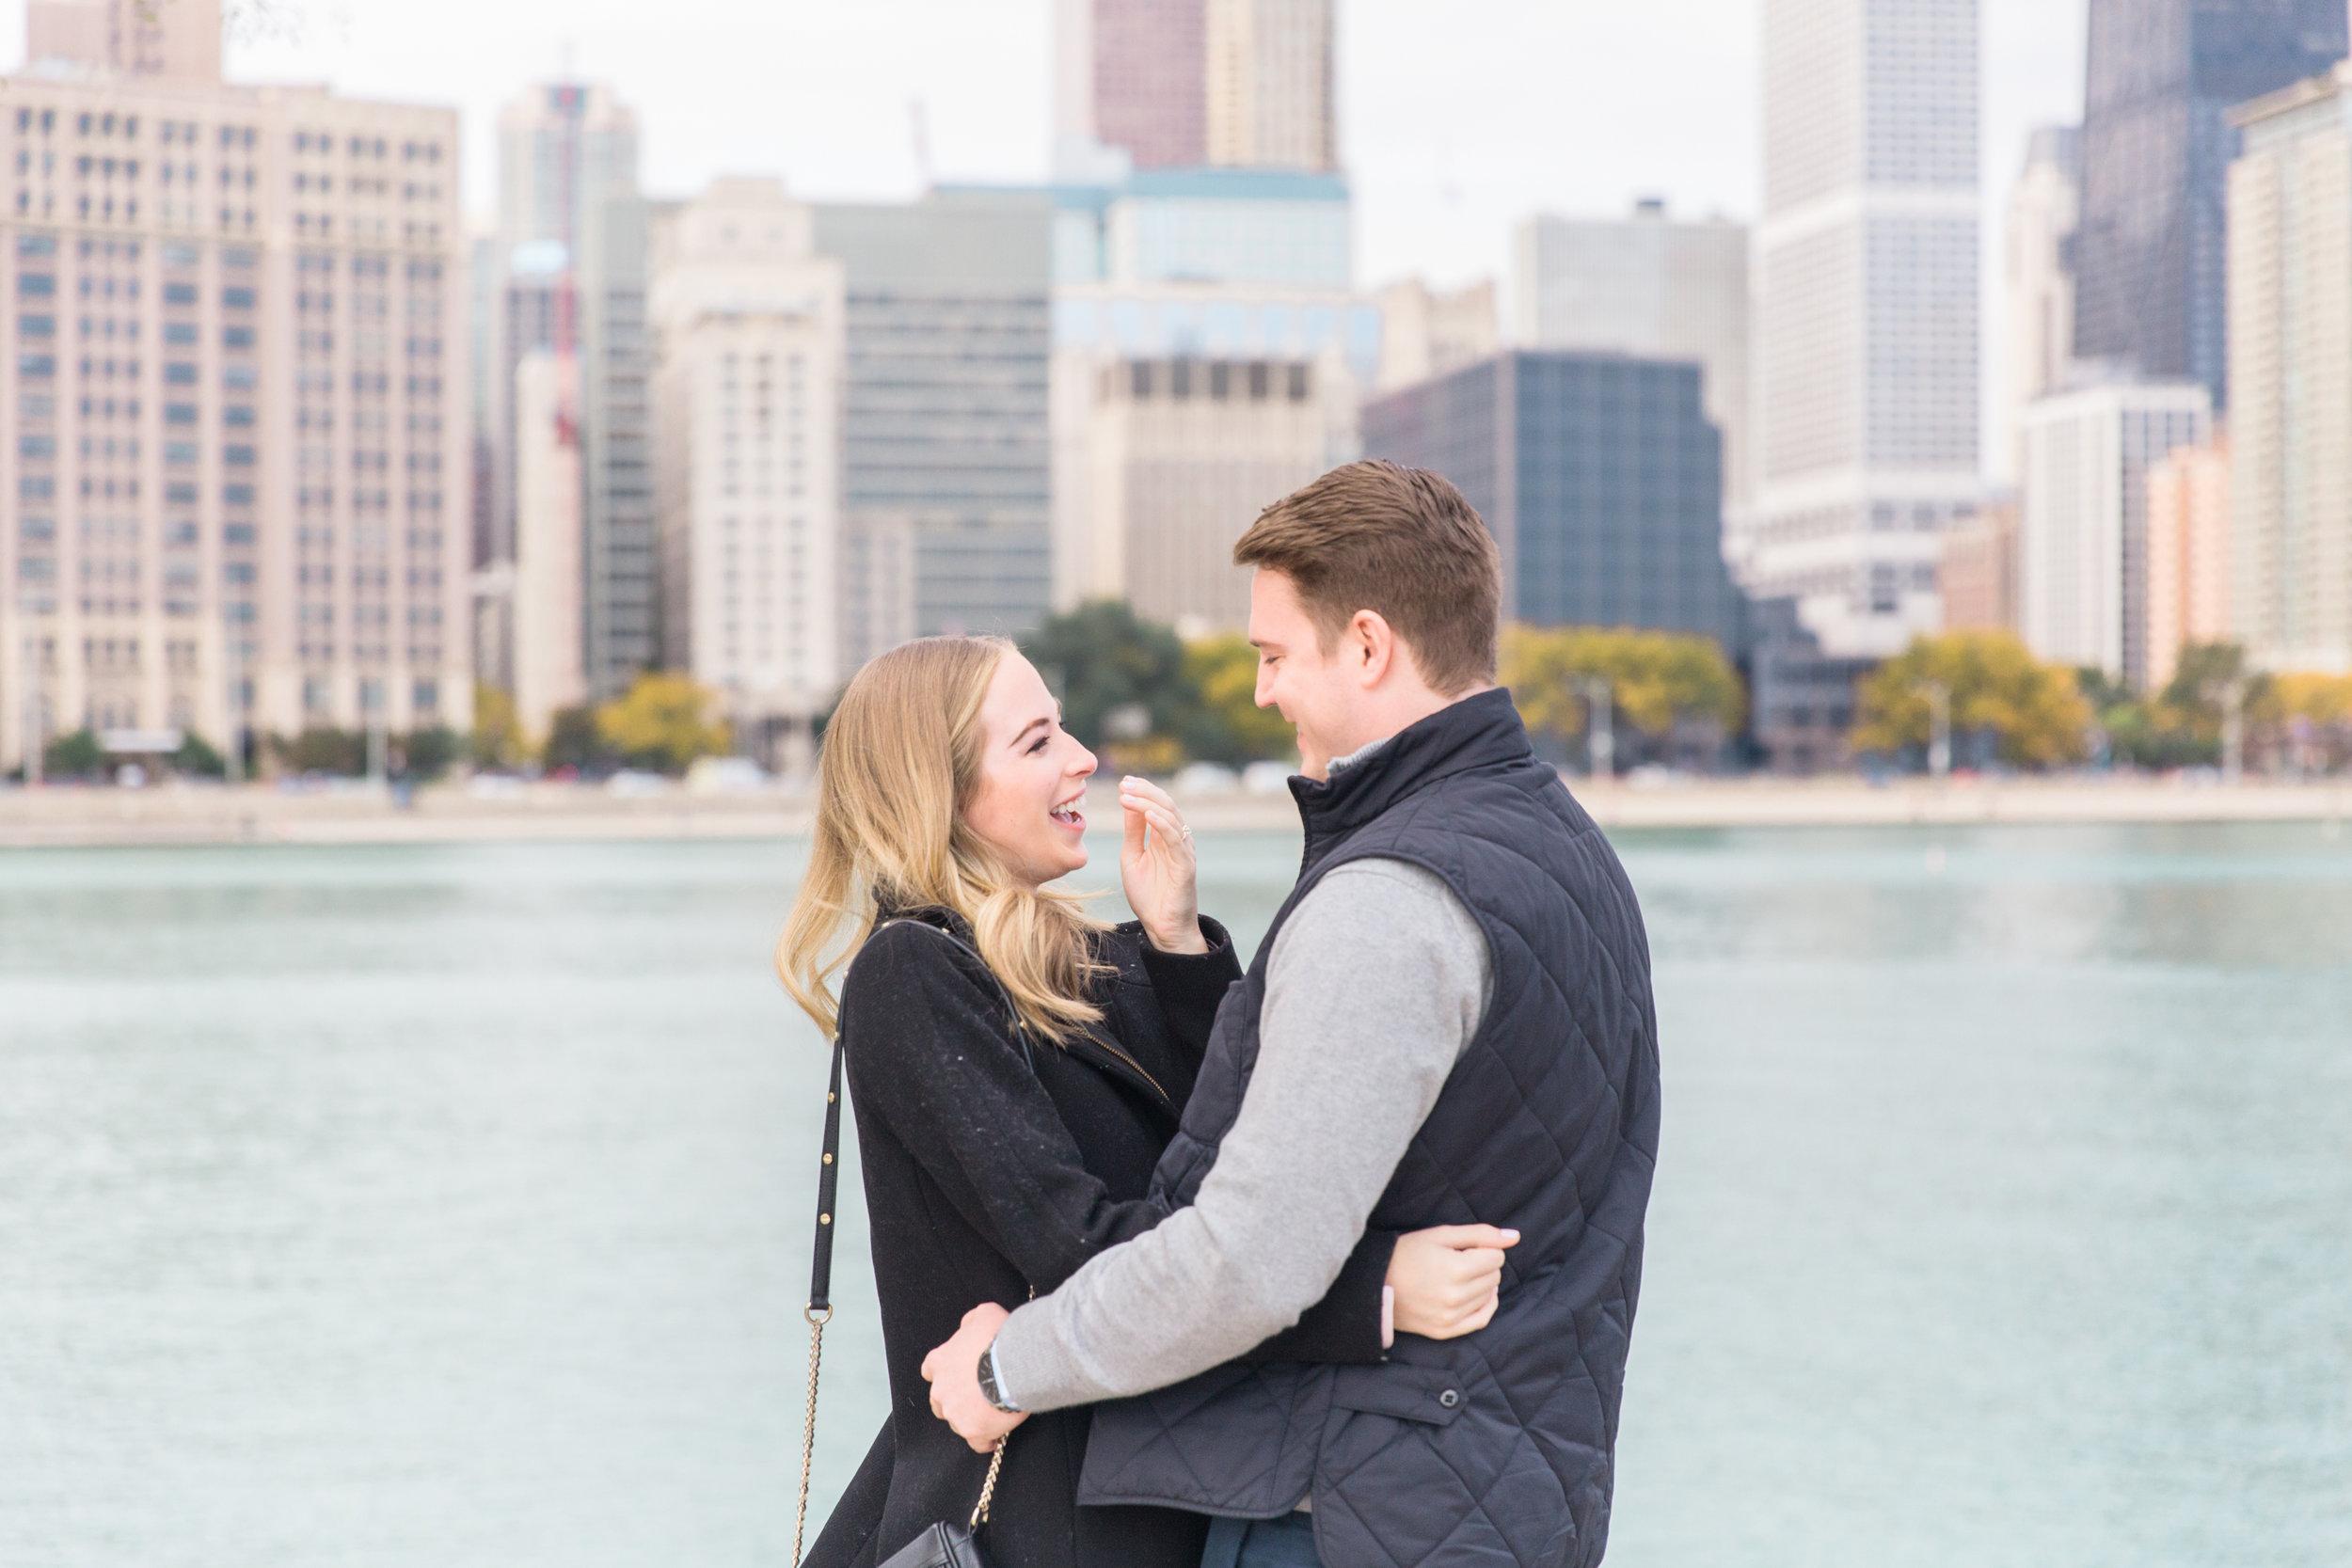 Bonphotage Chicago Proposal Photography